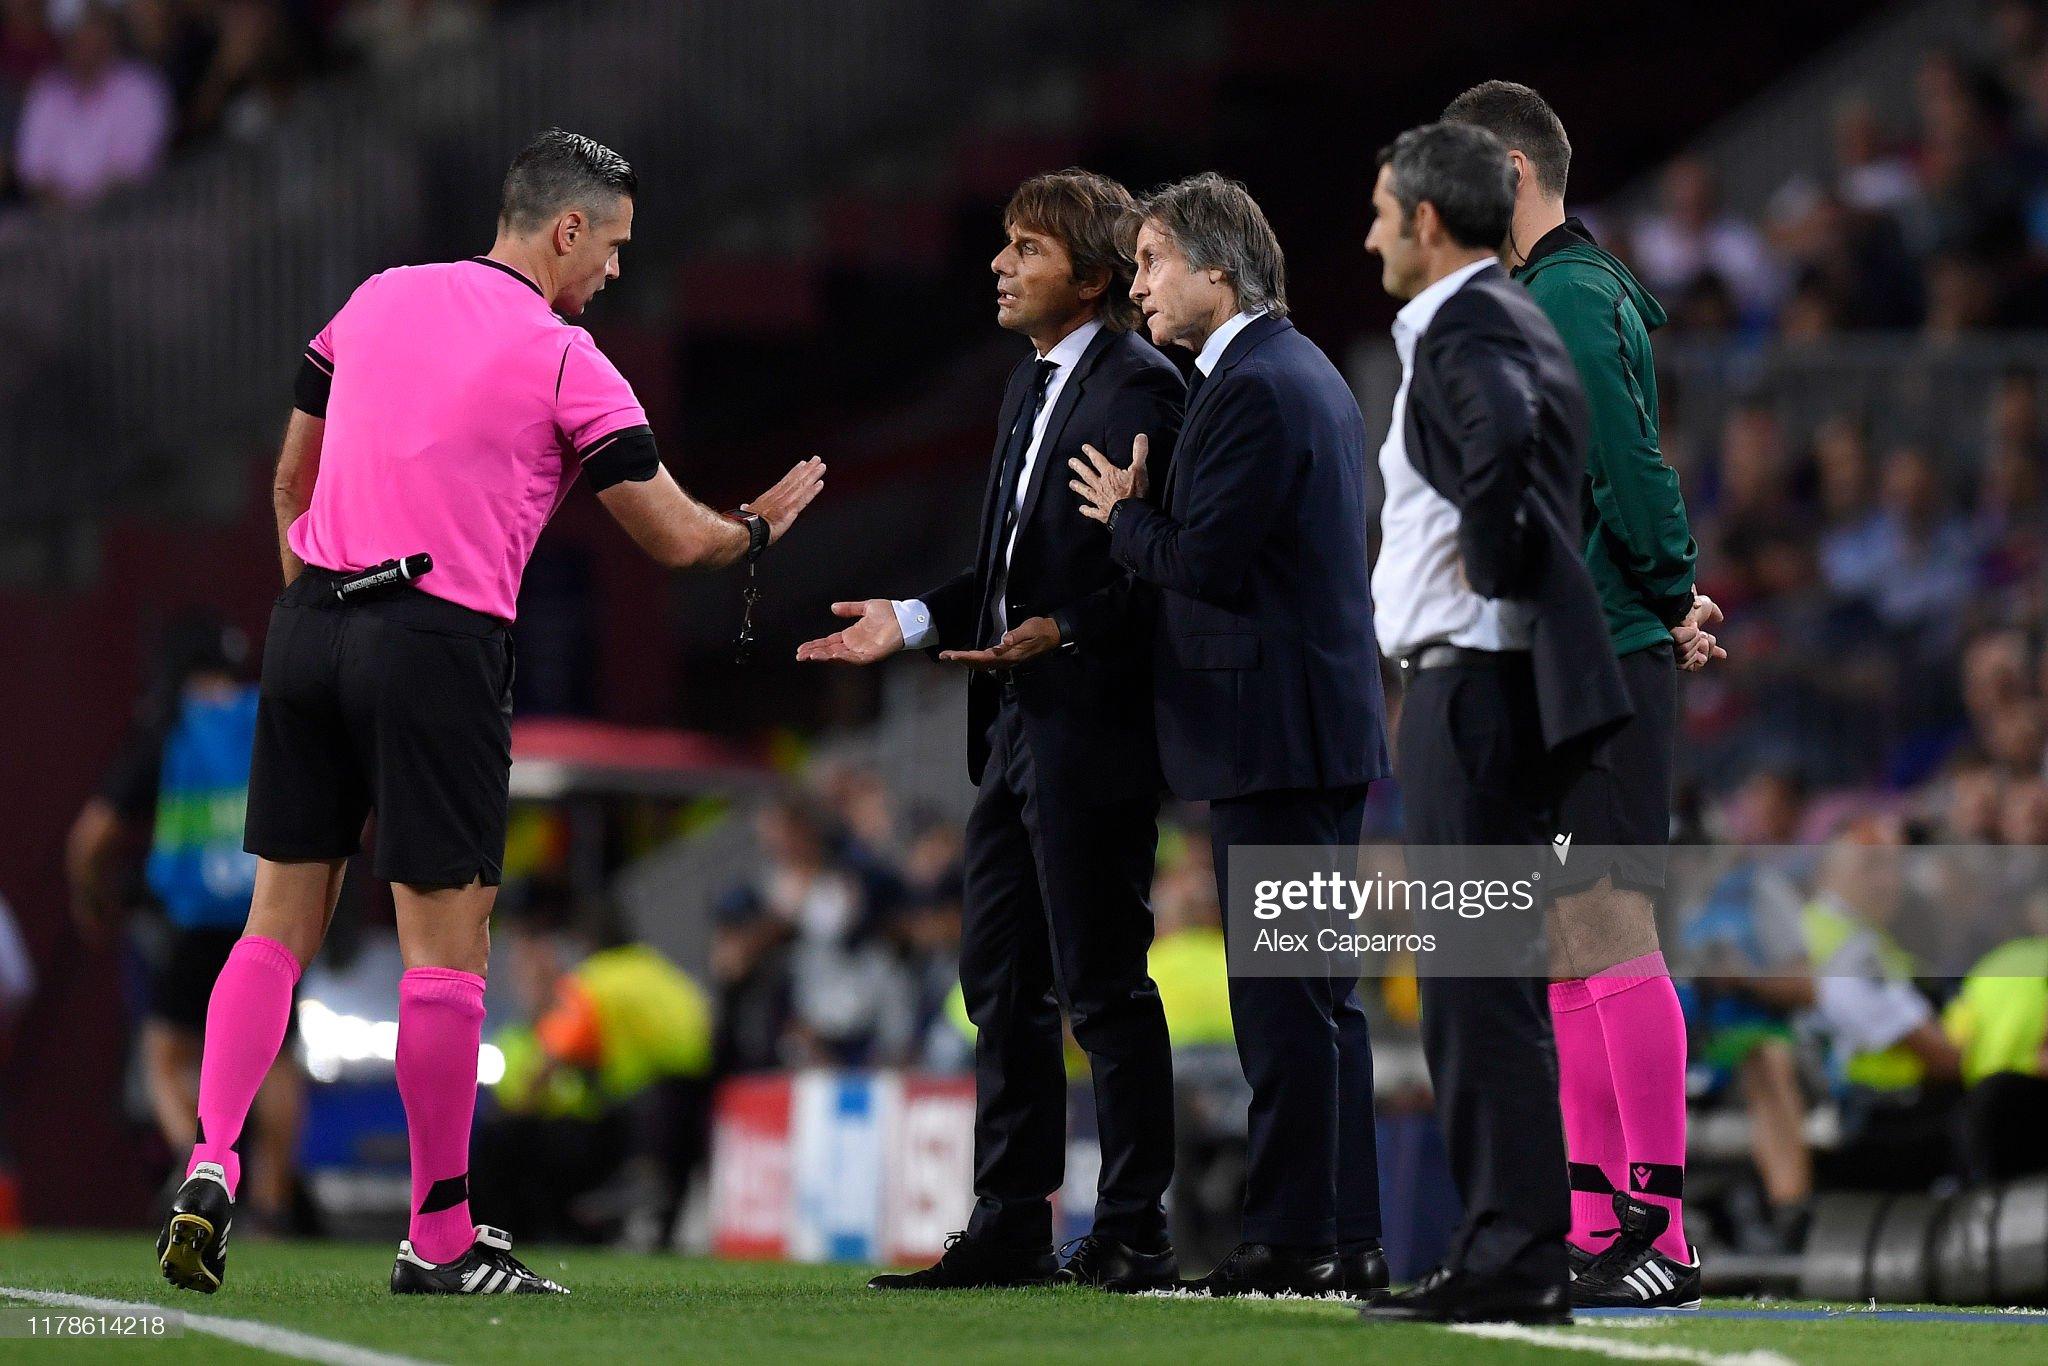 صور مباراة : برشلونة - إنتر 2-1 ( 02-10-2019 )  Antonio-conte-manager-of-inter-milan-speaks-with-the-referee-during-picture-id1178614218?s=2048x2048